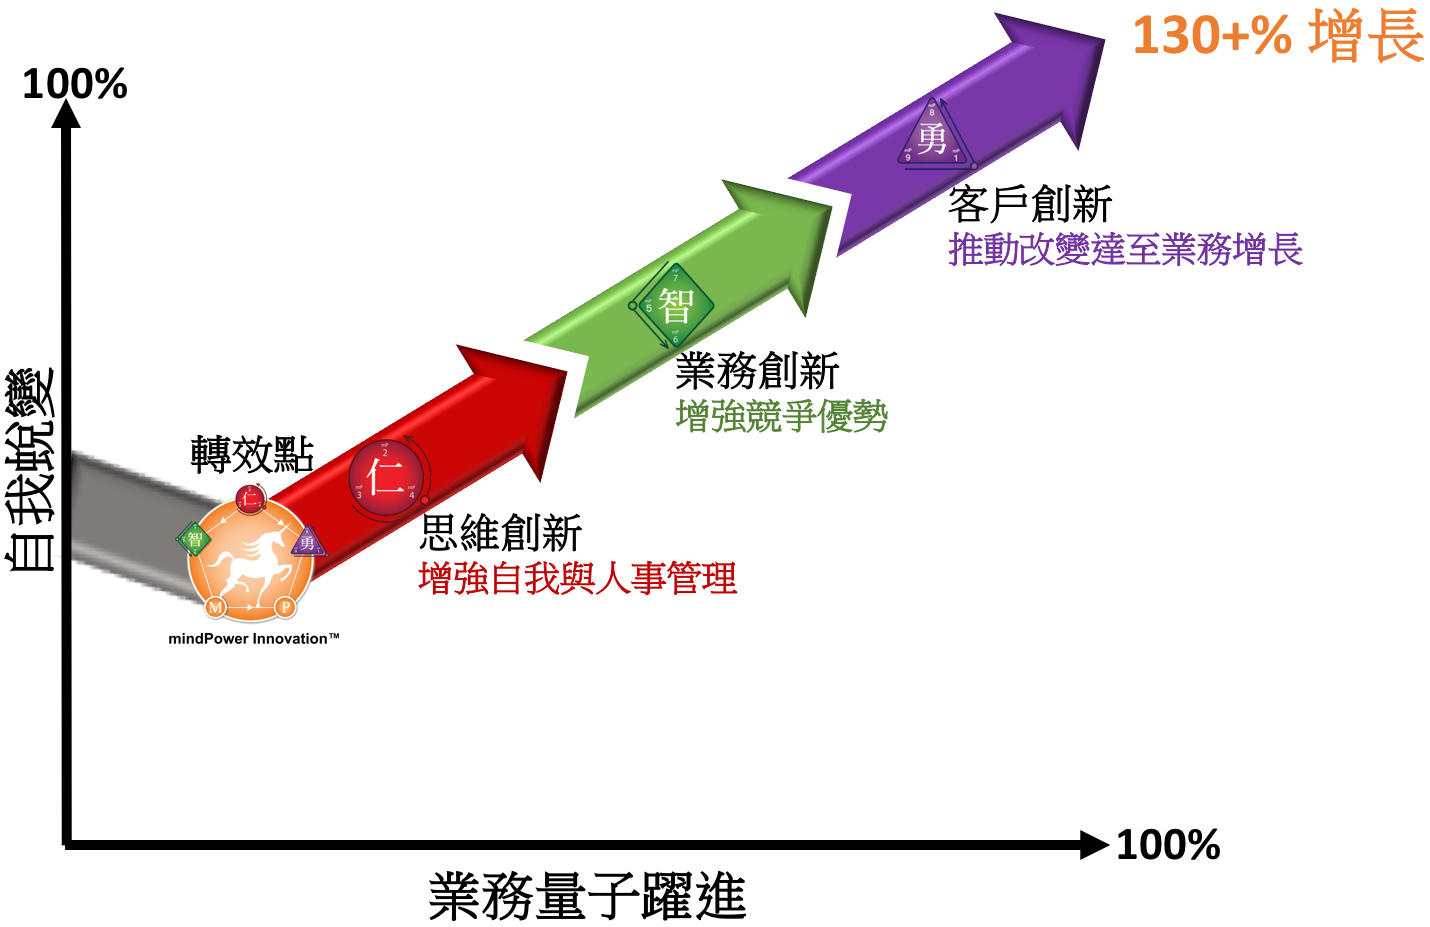 mindPower Innovation™ model.png